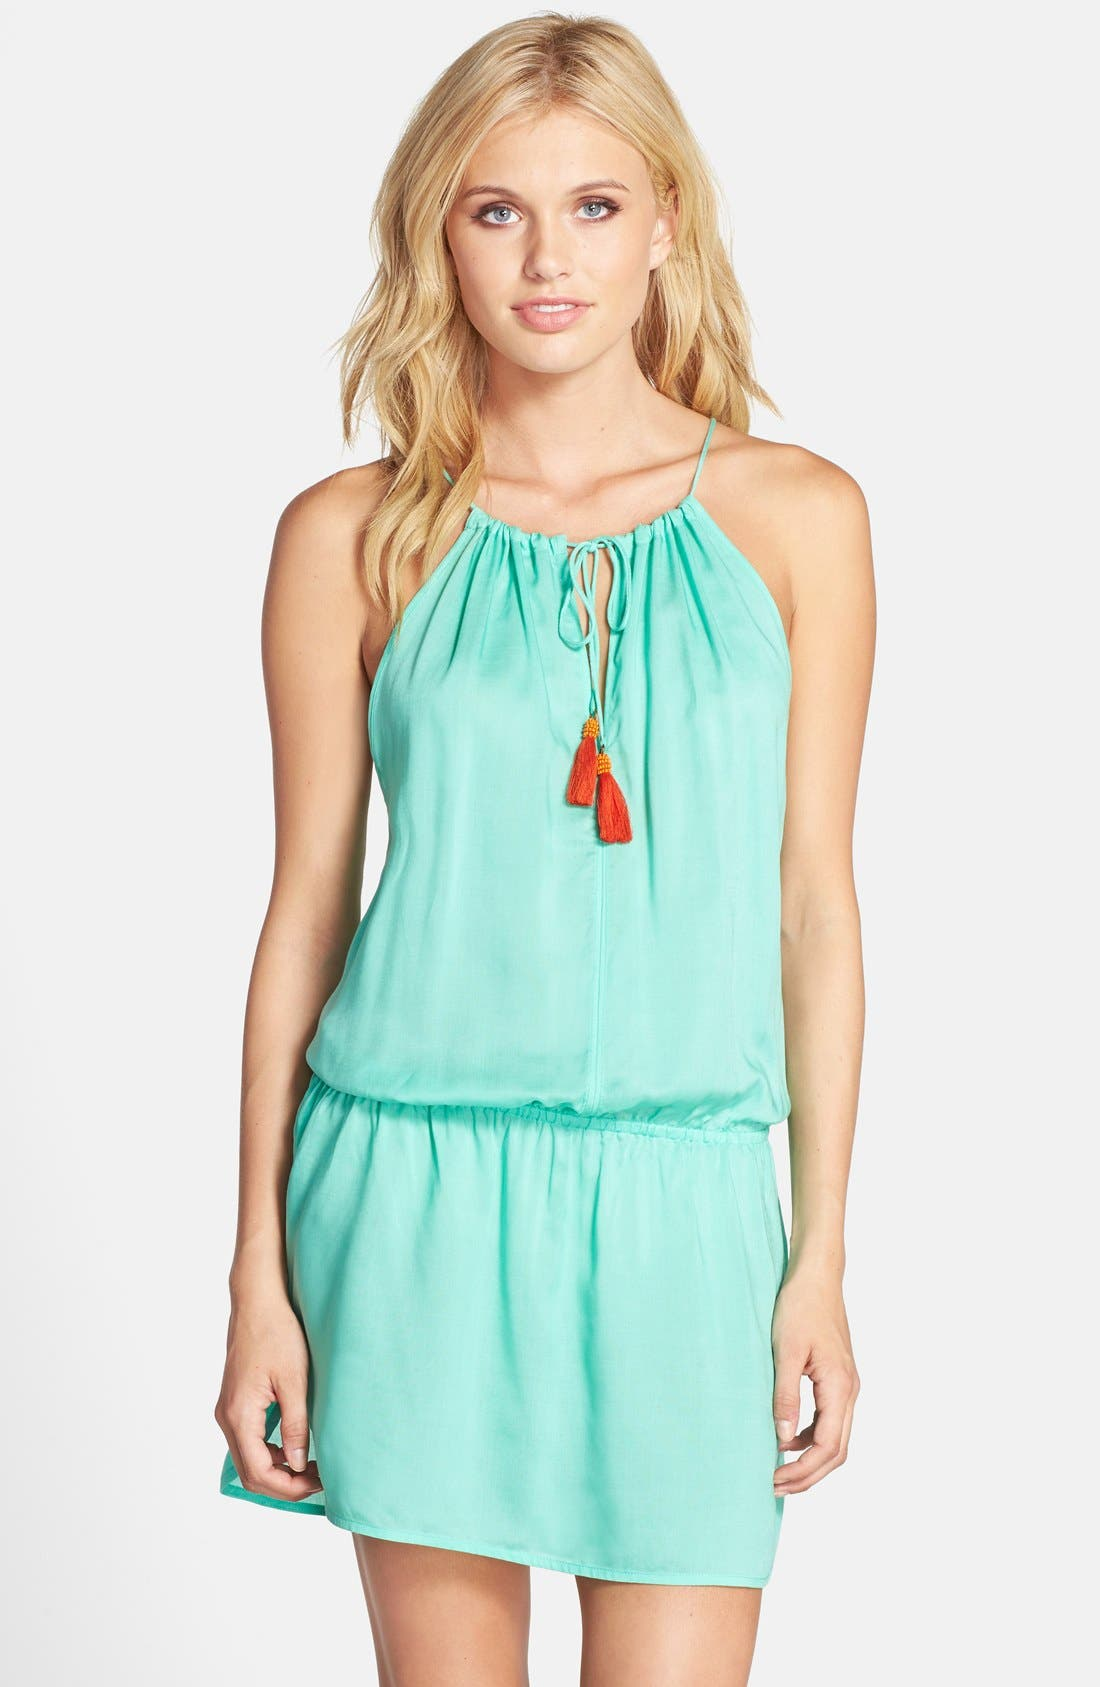 Main Image - Sofia by ViX Swimwear Drop Waist Cover-Up Dress